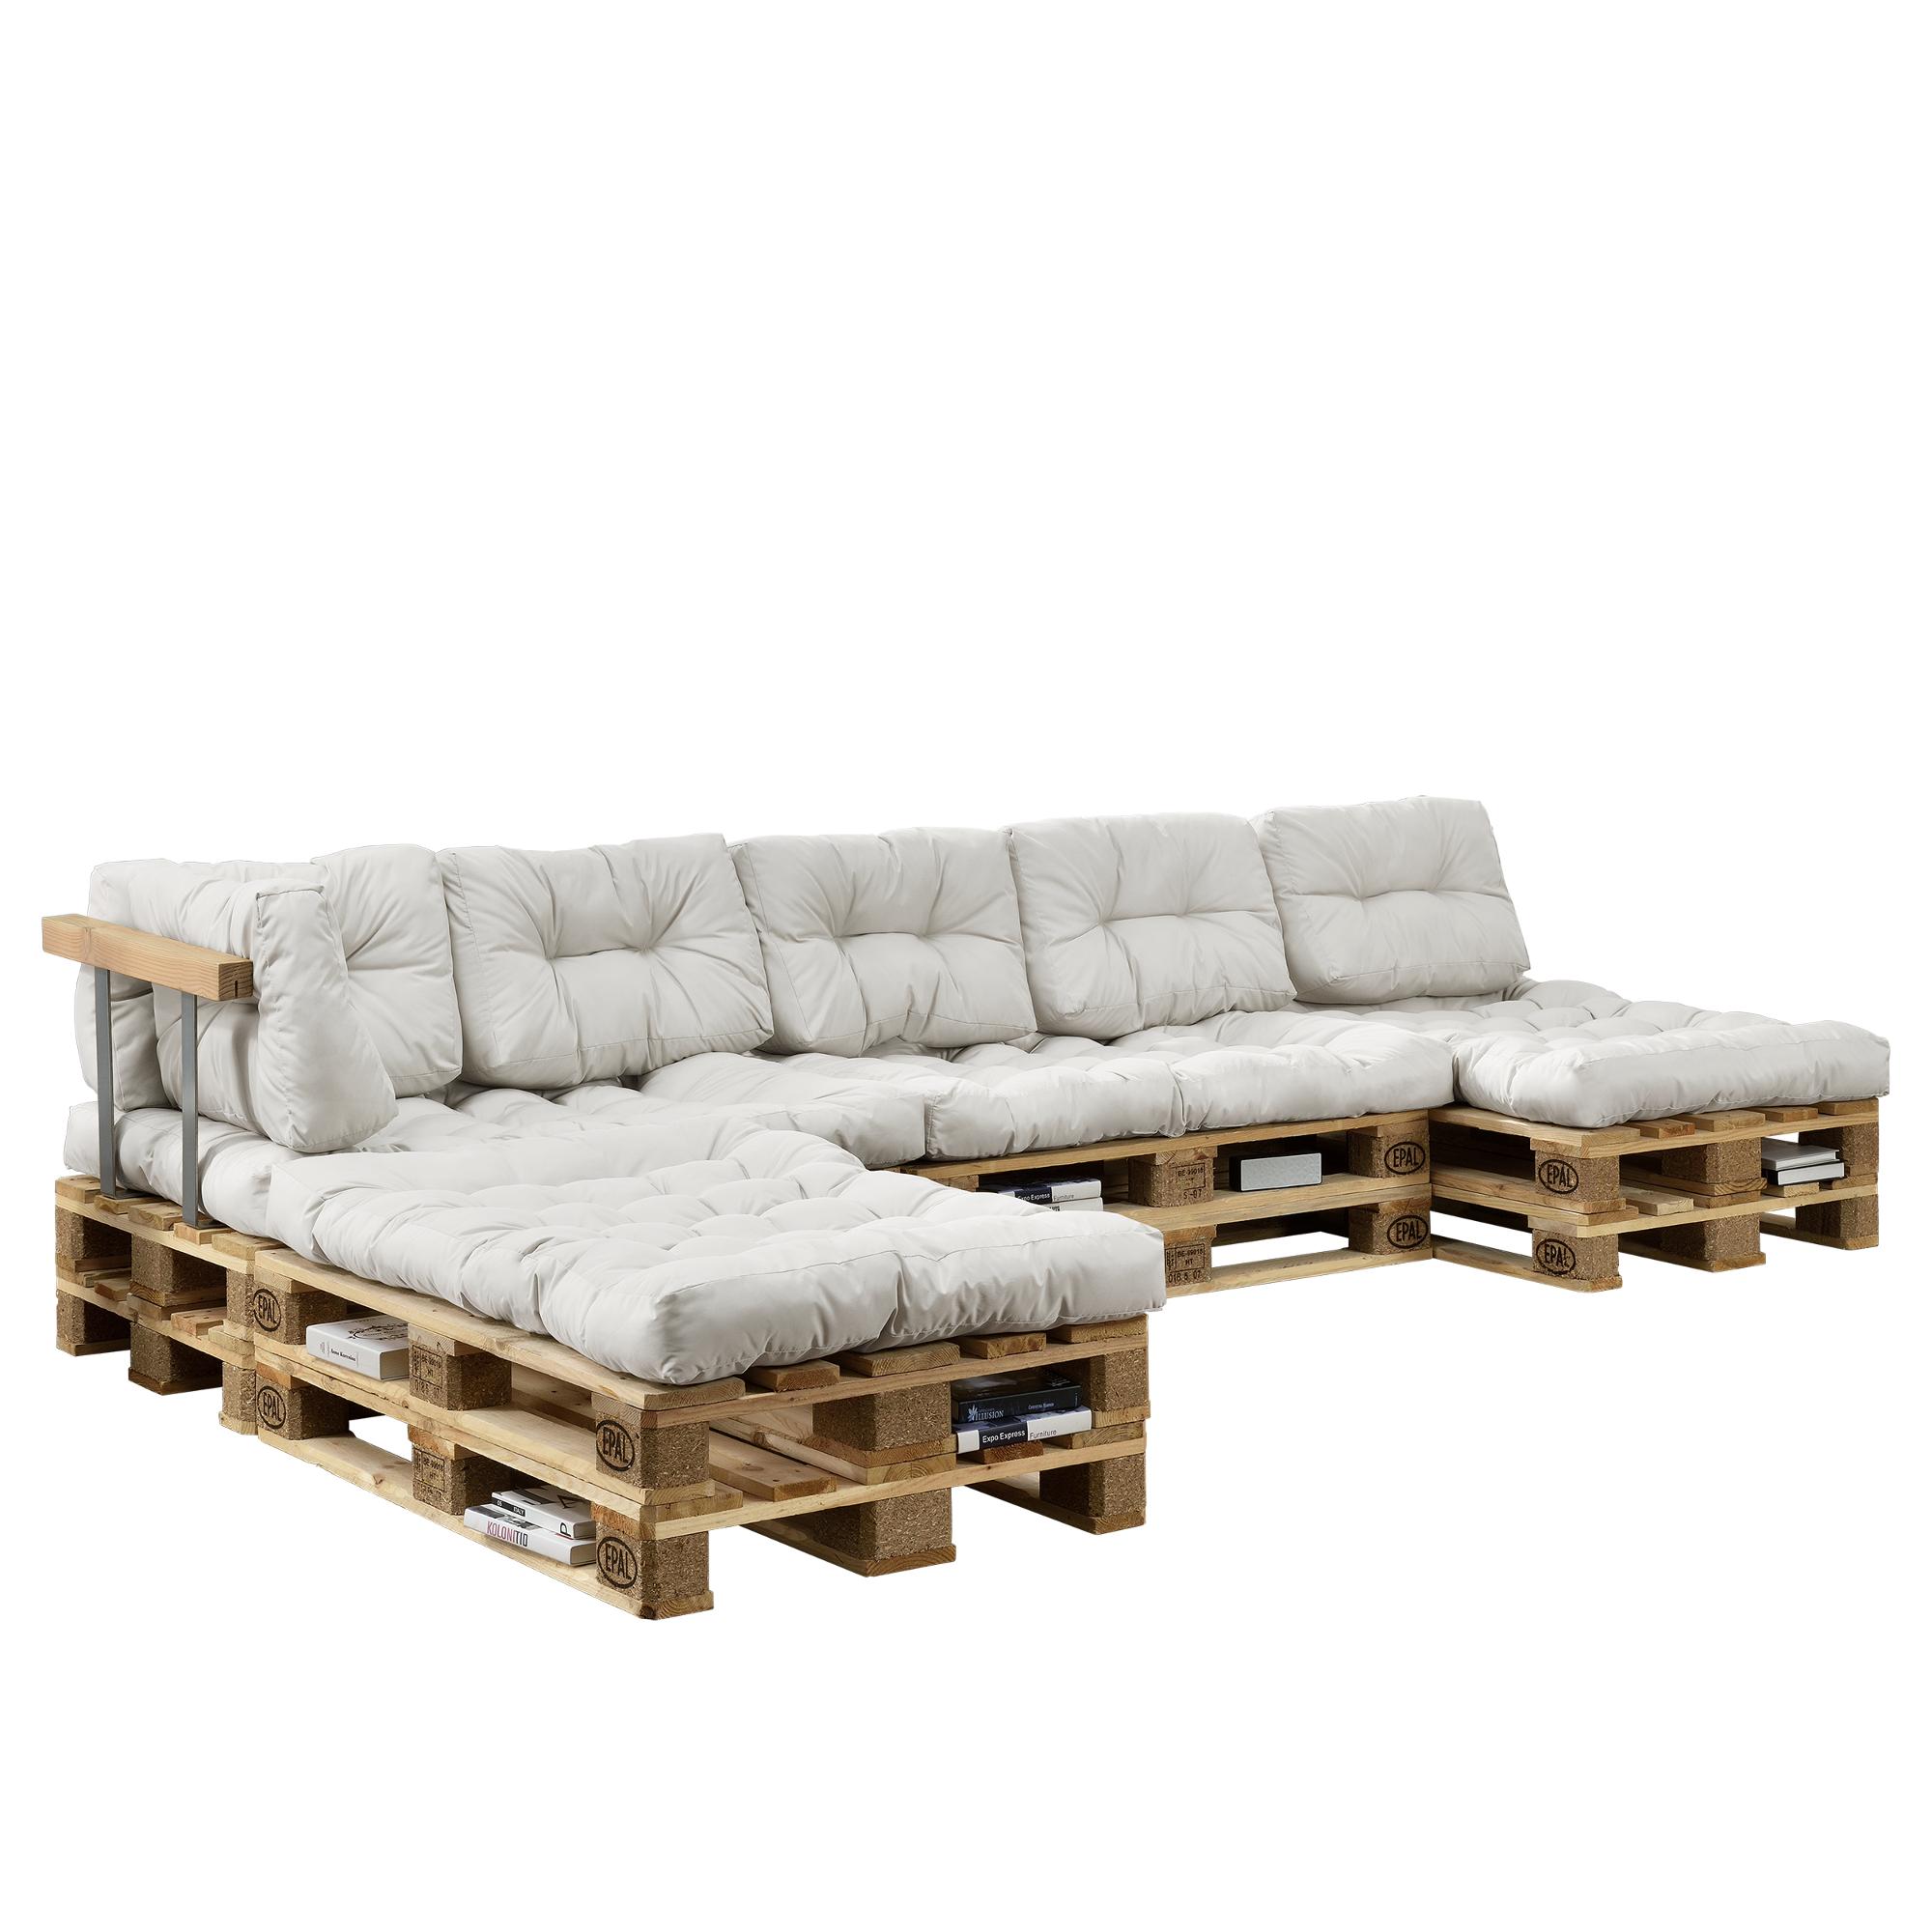 euro palettes canap set blanc int rieur. Black Bedroom Furniture Sets. Home Design Ideas